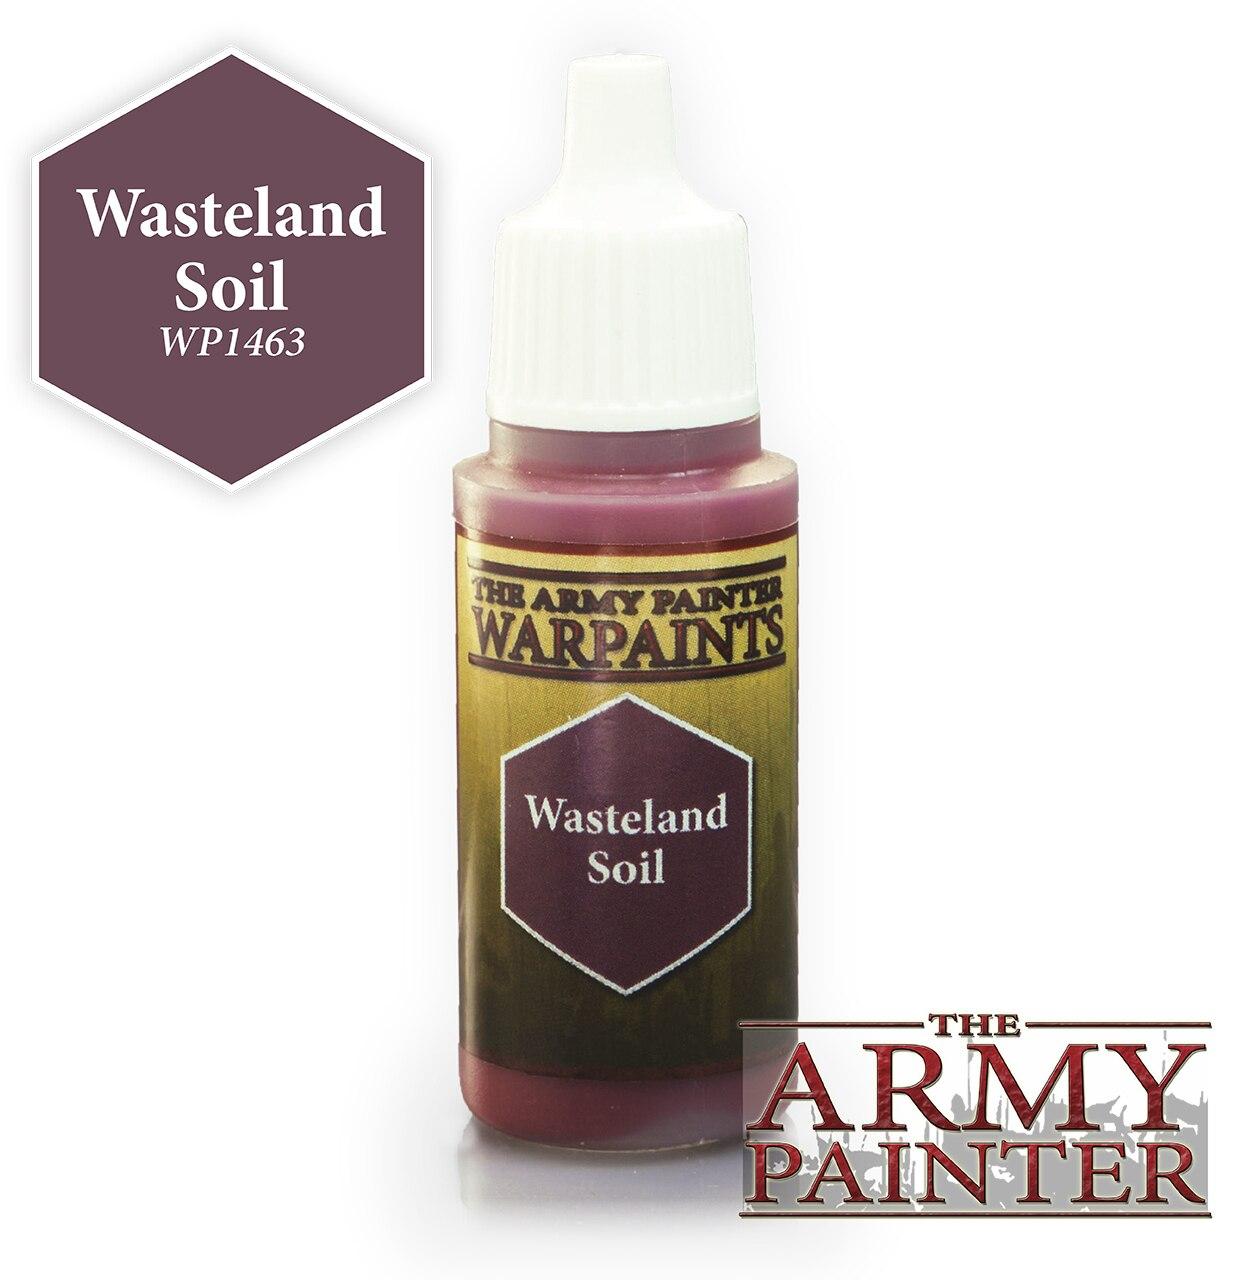 Army Painter Warpaint - Wasteland Soil